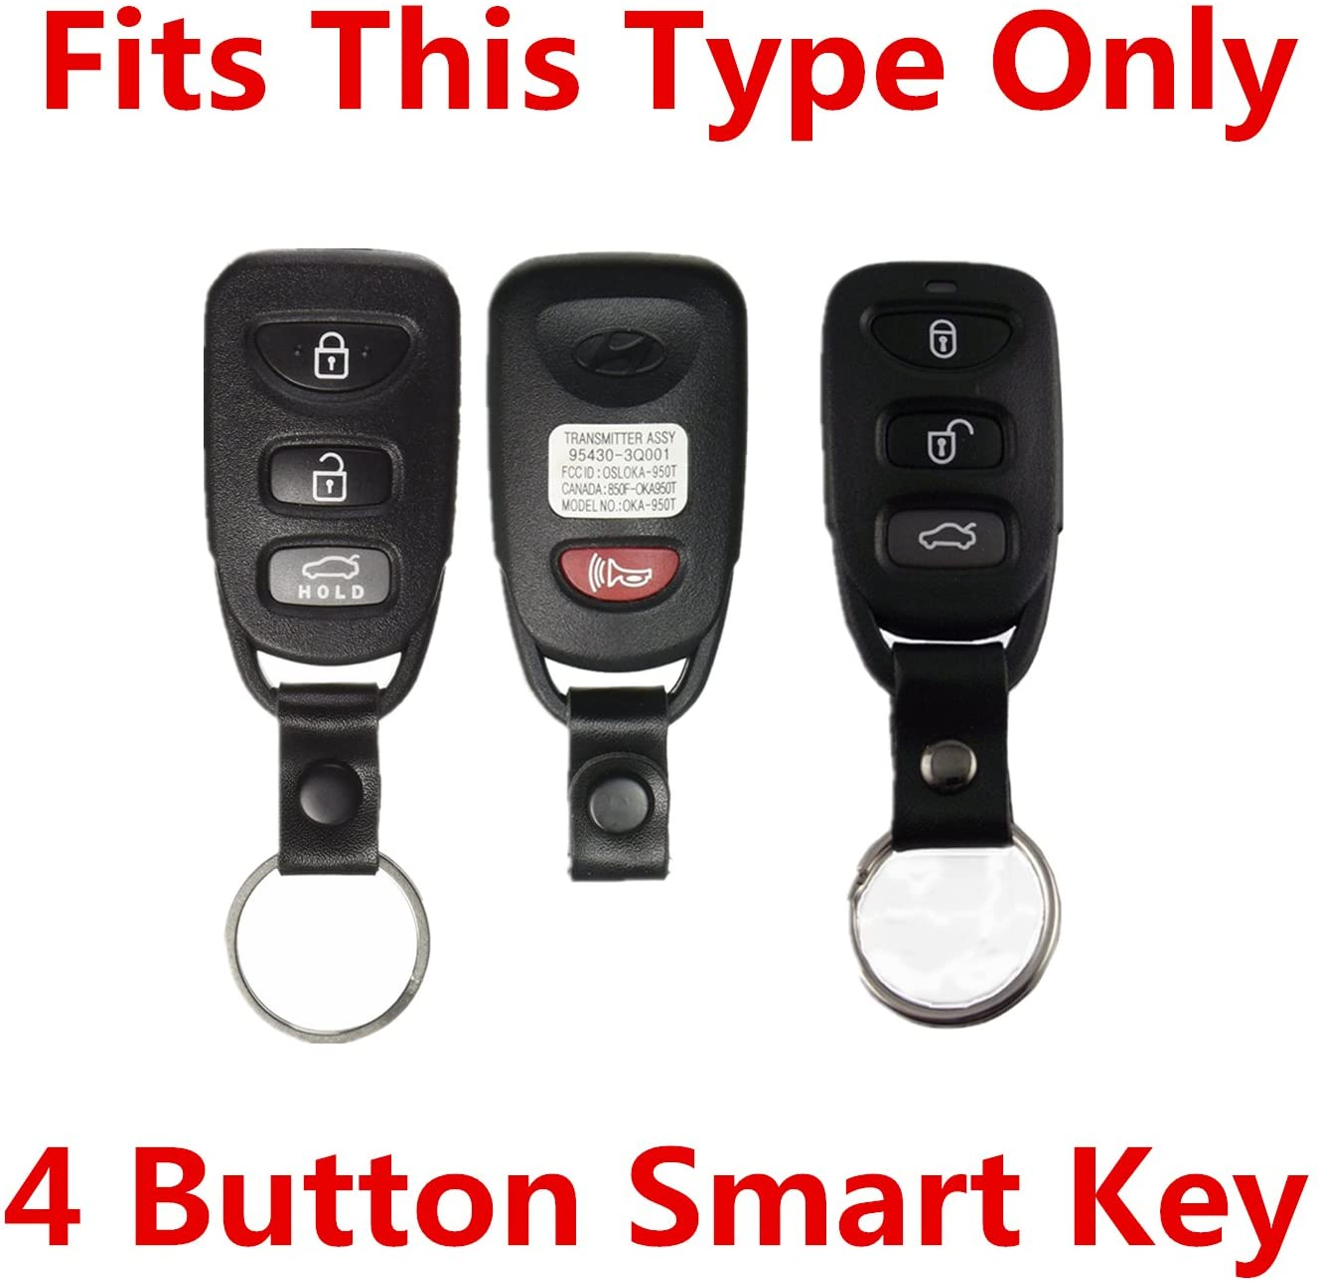 Pink Rpkey Silicone Keyless Entry Remote Control Key Fob Cover Case protector For Hyundai Accent Elantra Sonata Kia Optima Rondo Spectra 95430-2G202 95430-3X500 95430-3K200 95430-3K201 OSLOKA-310T